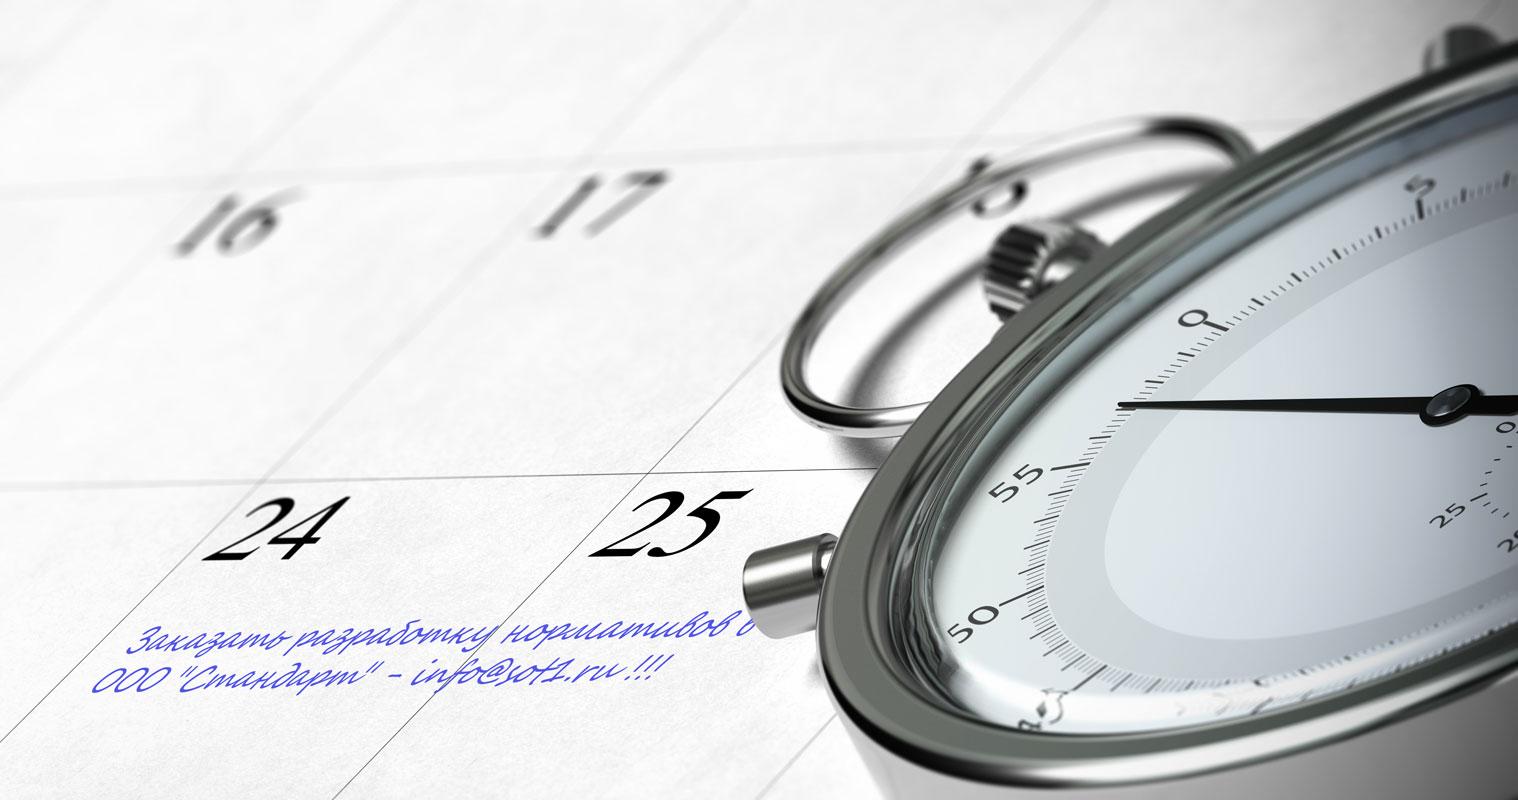 Порядок и сроки разработки проекта на отходы.